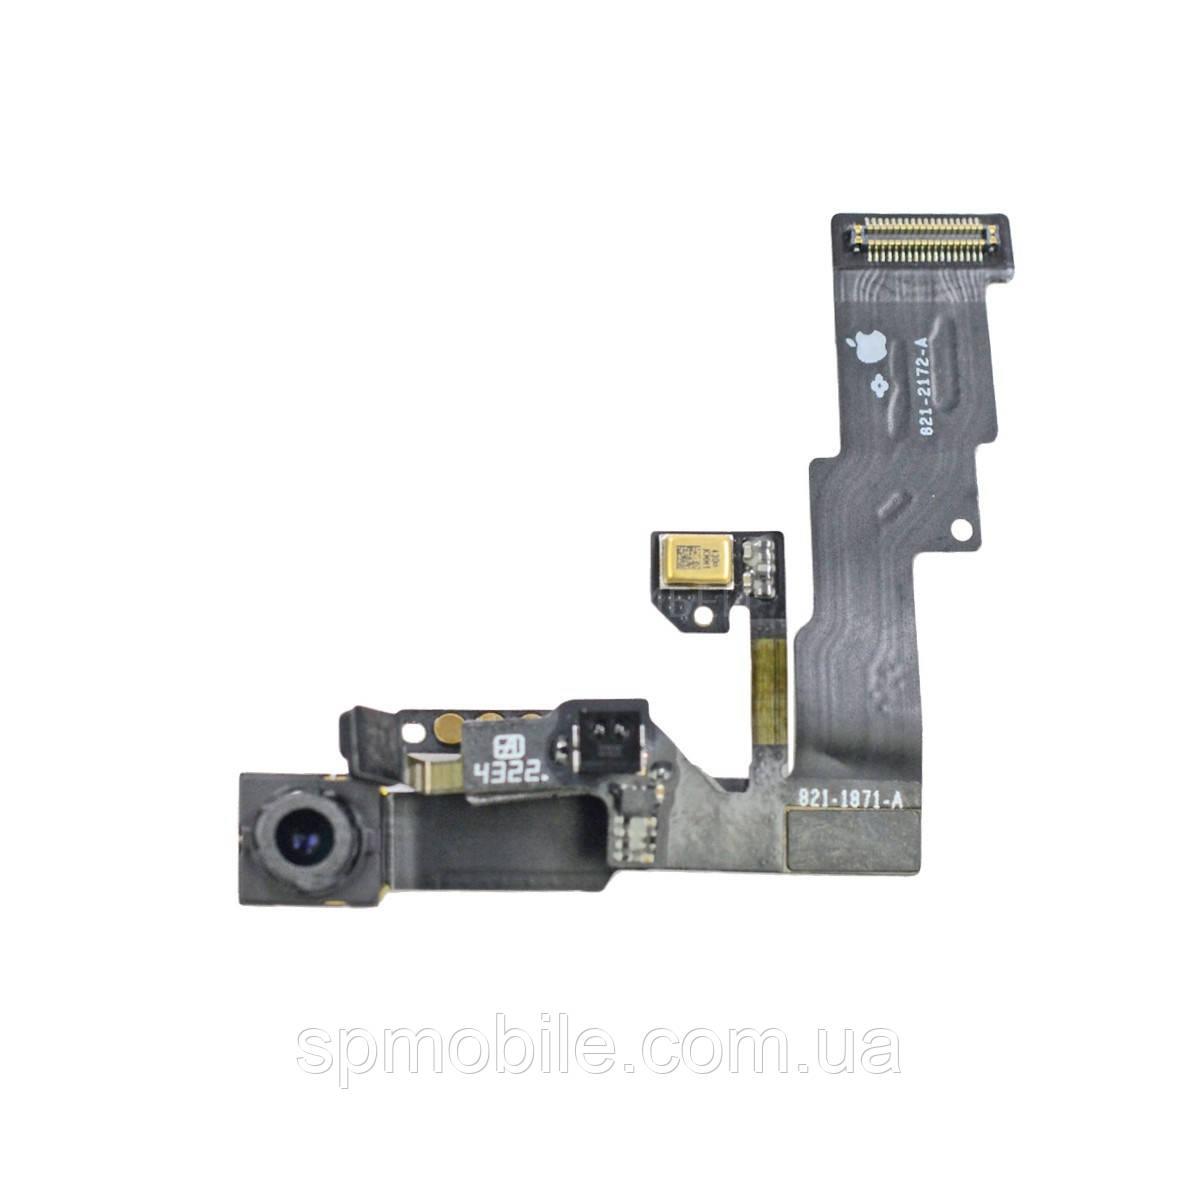 "Шлейф Apple iPhone 6 (4,7"") (+Sensor. Mic. Front. camera) Original"